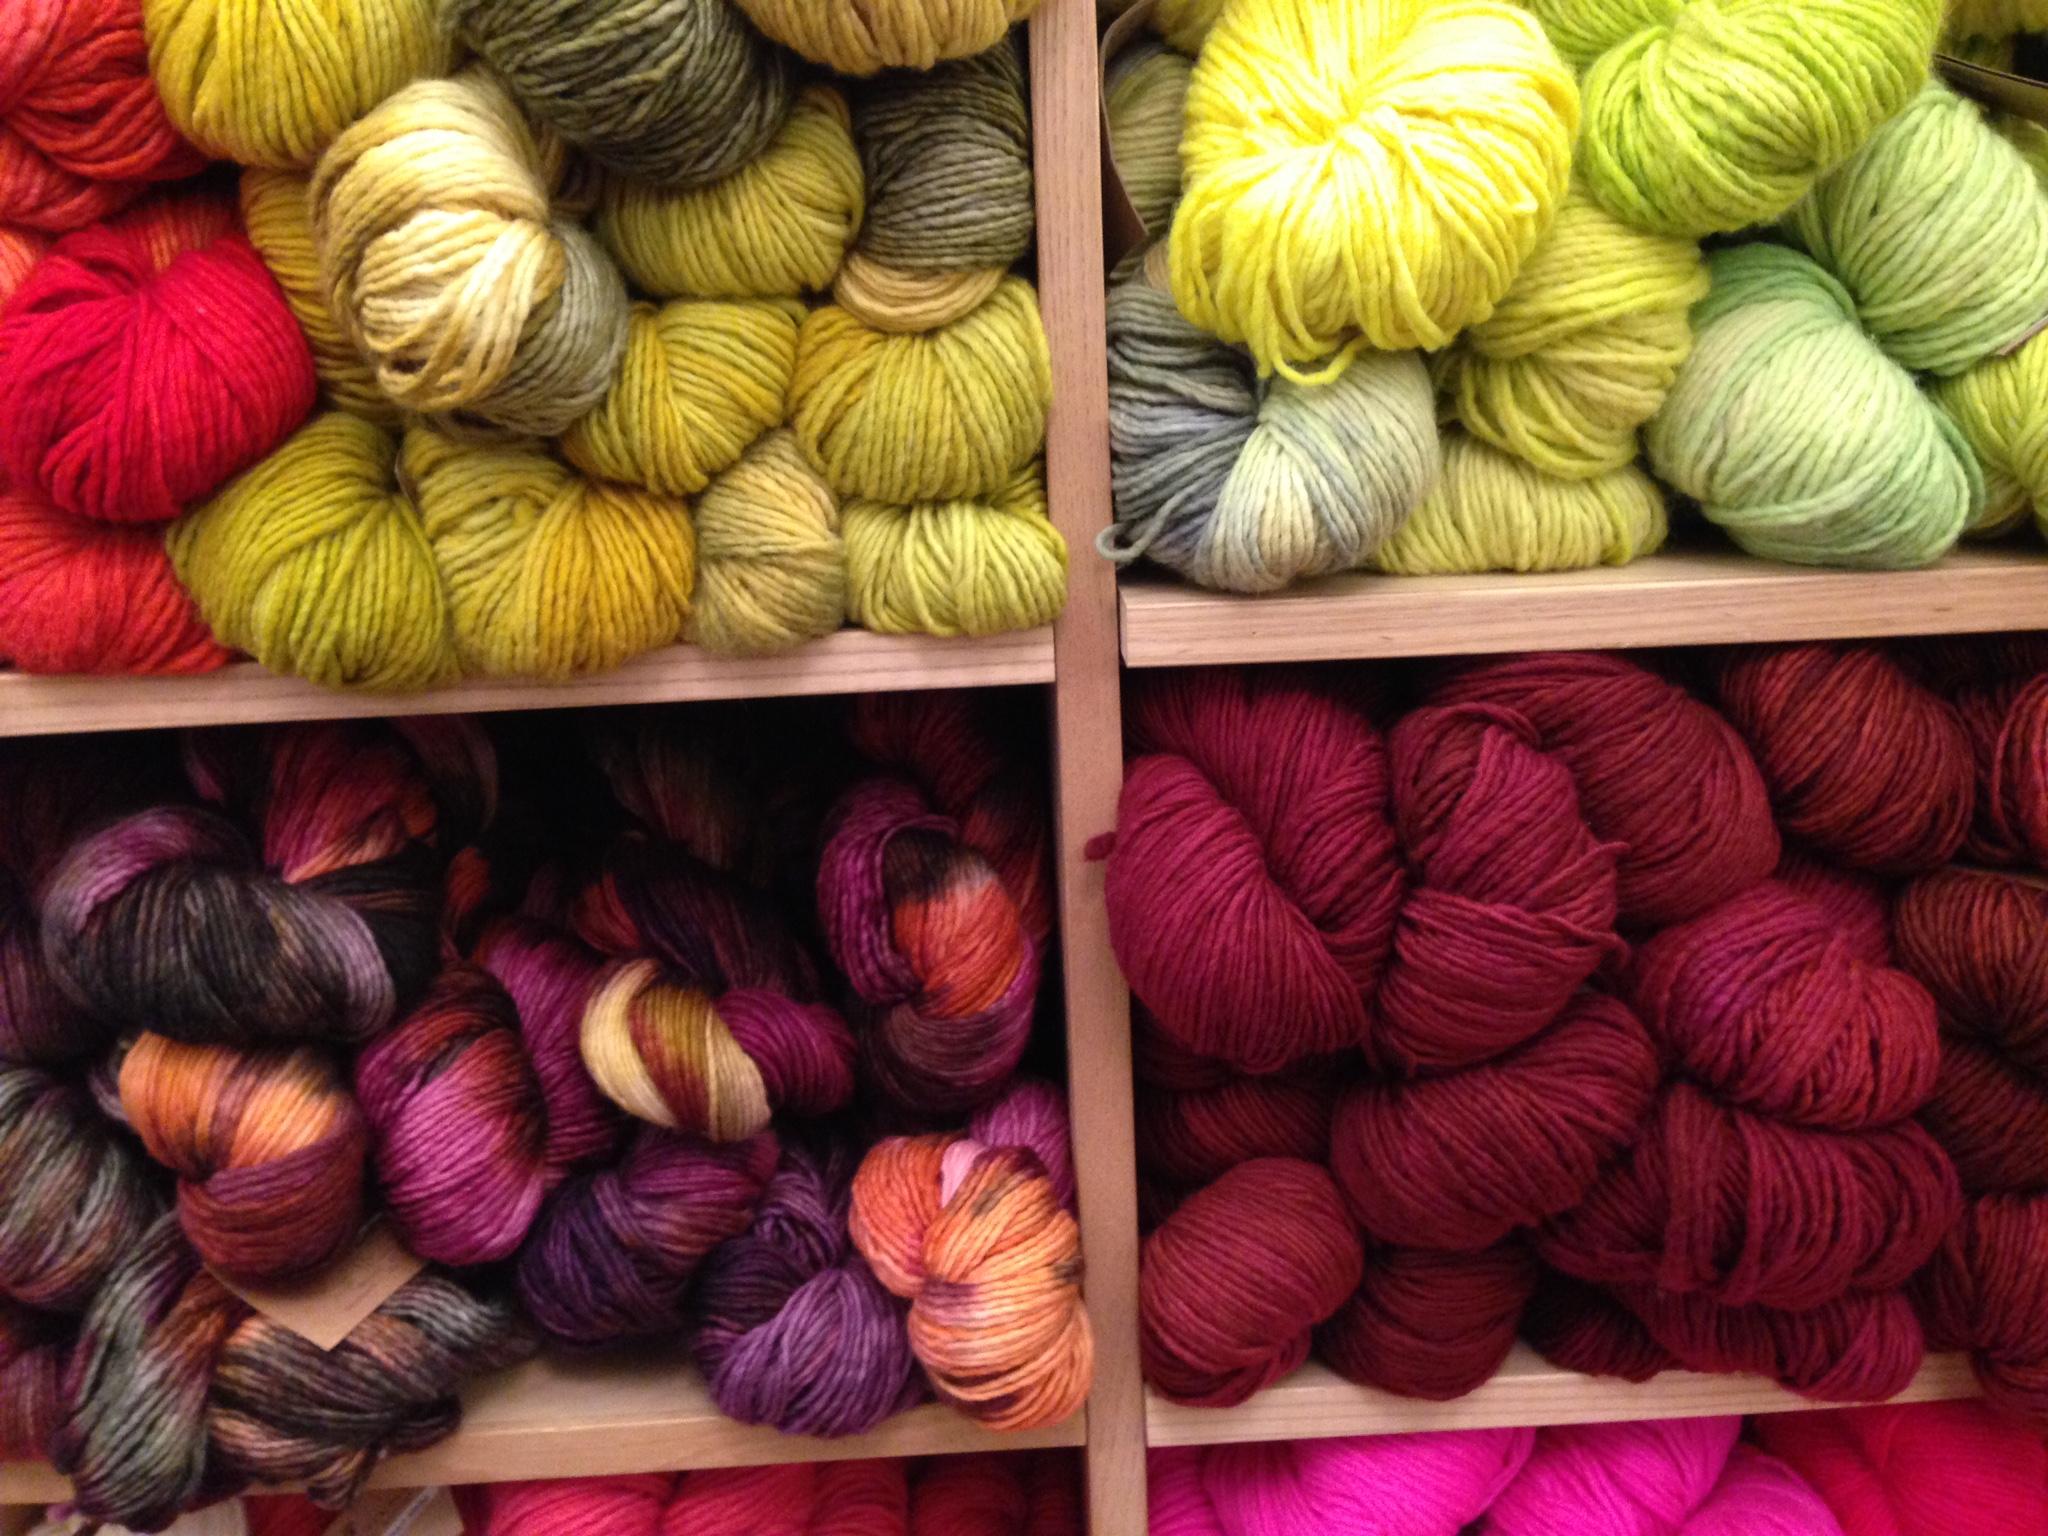 shelves with yarn.JPG